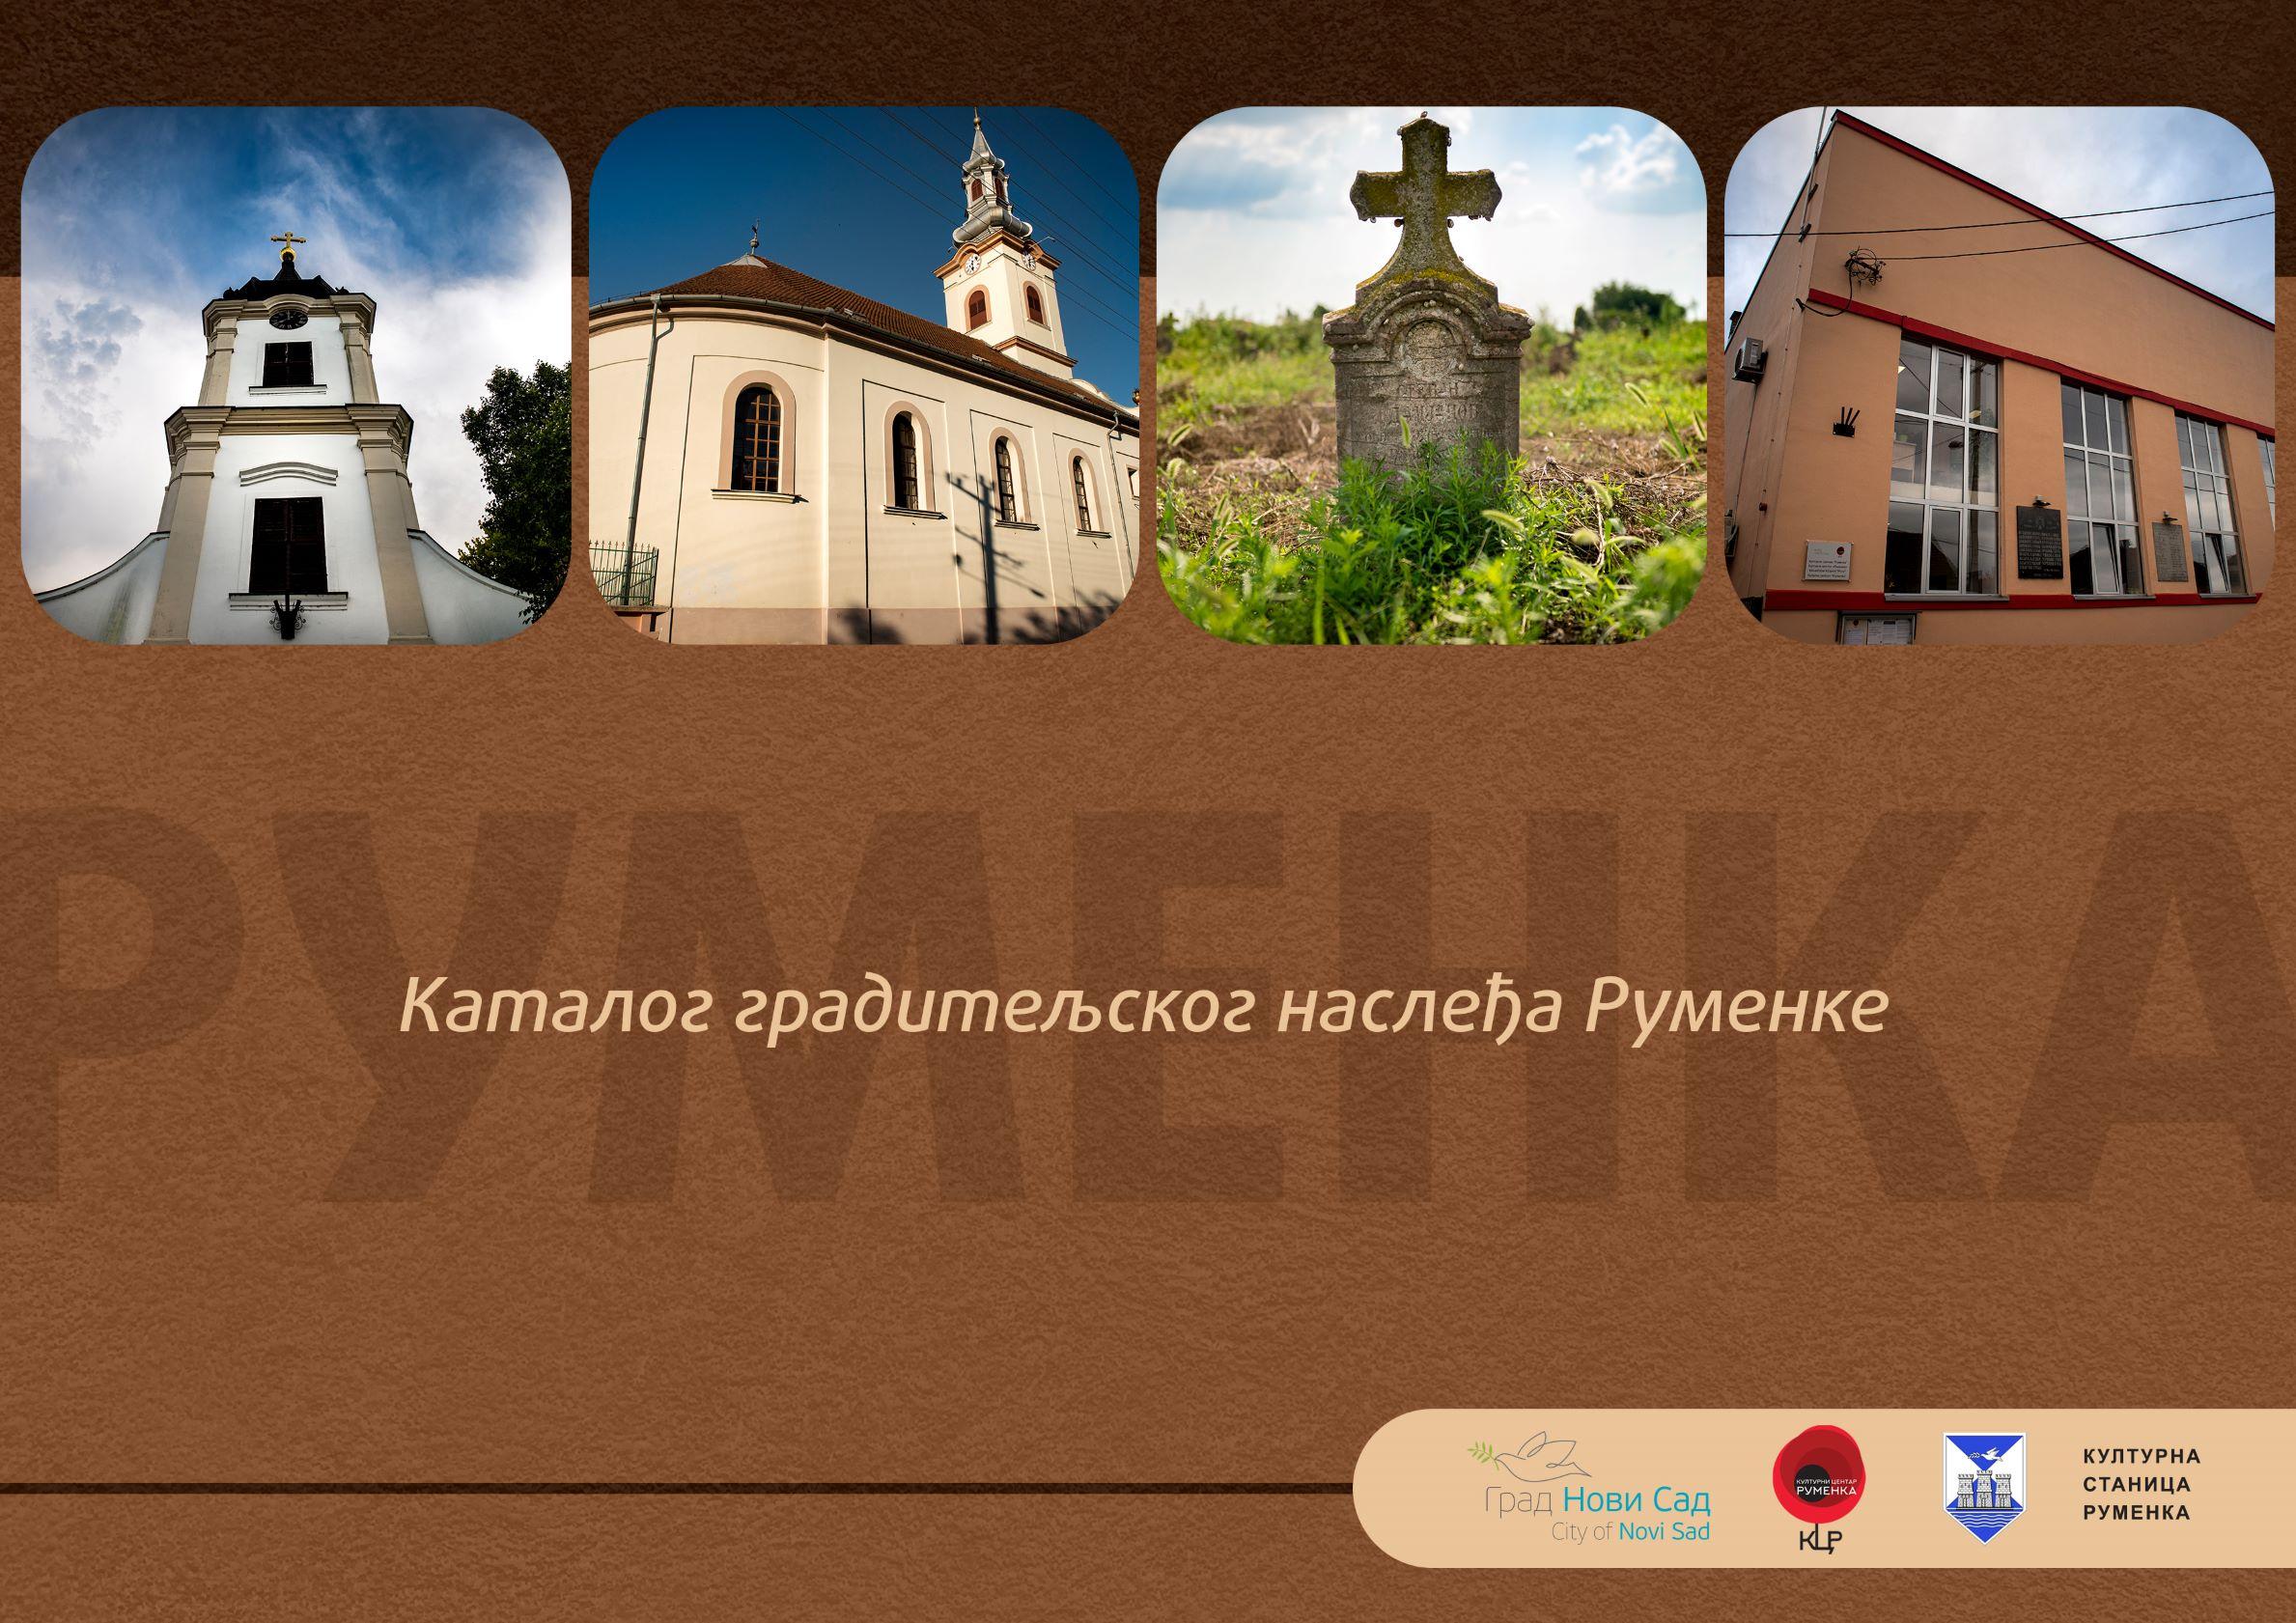 Katalog graditeljskog nasleđa Rumenke Каталог градитељског наслеђа Руменке